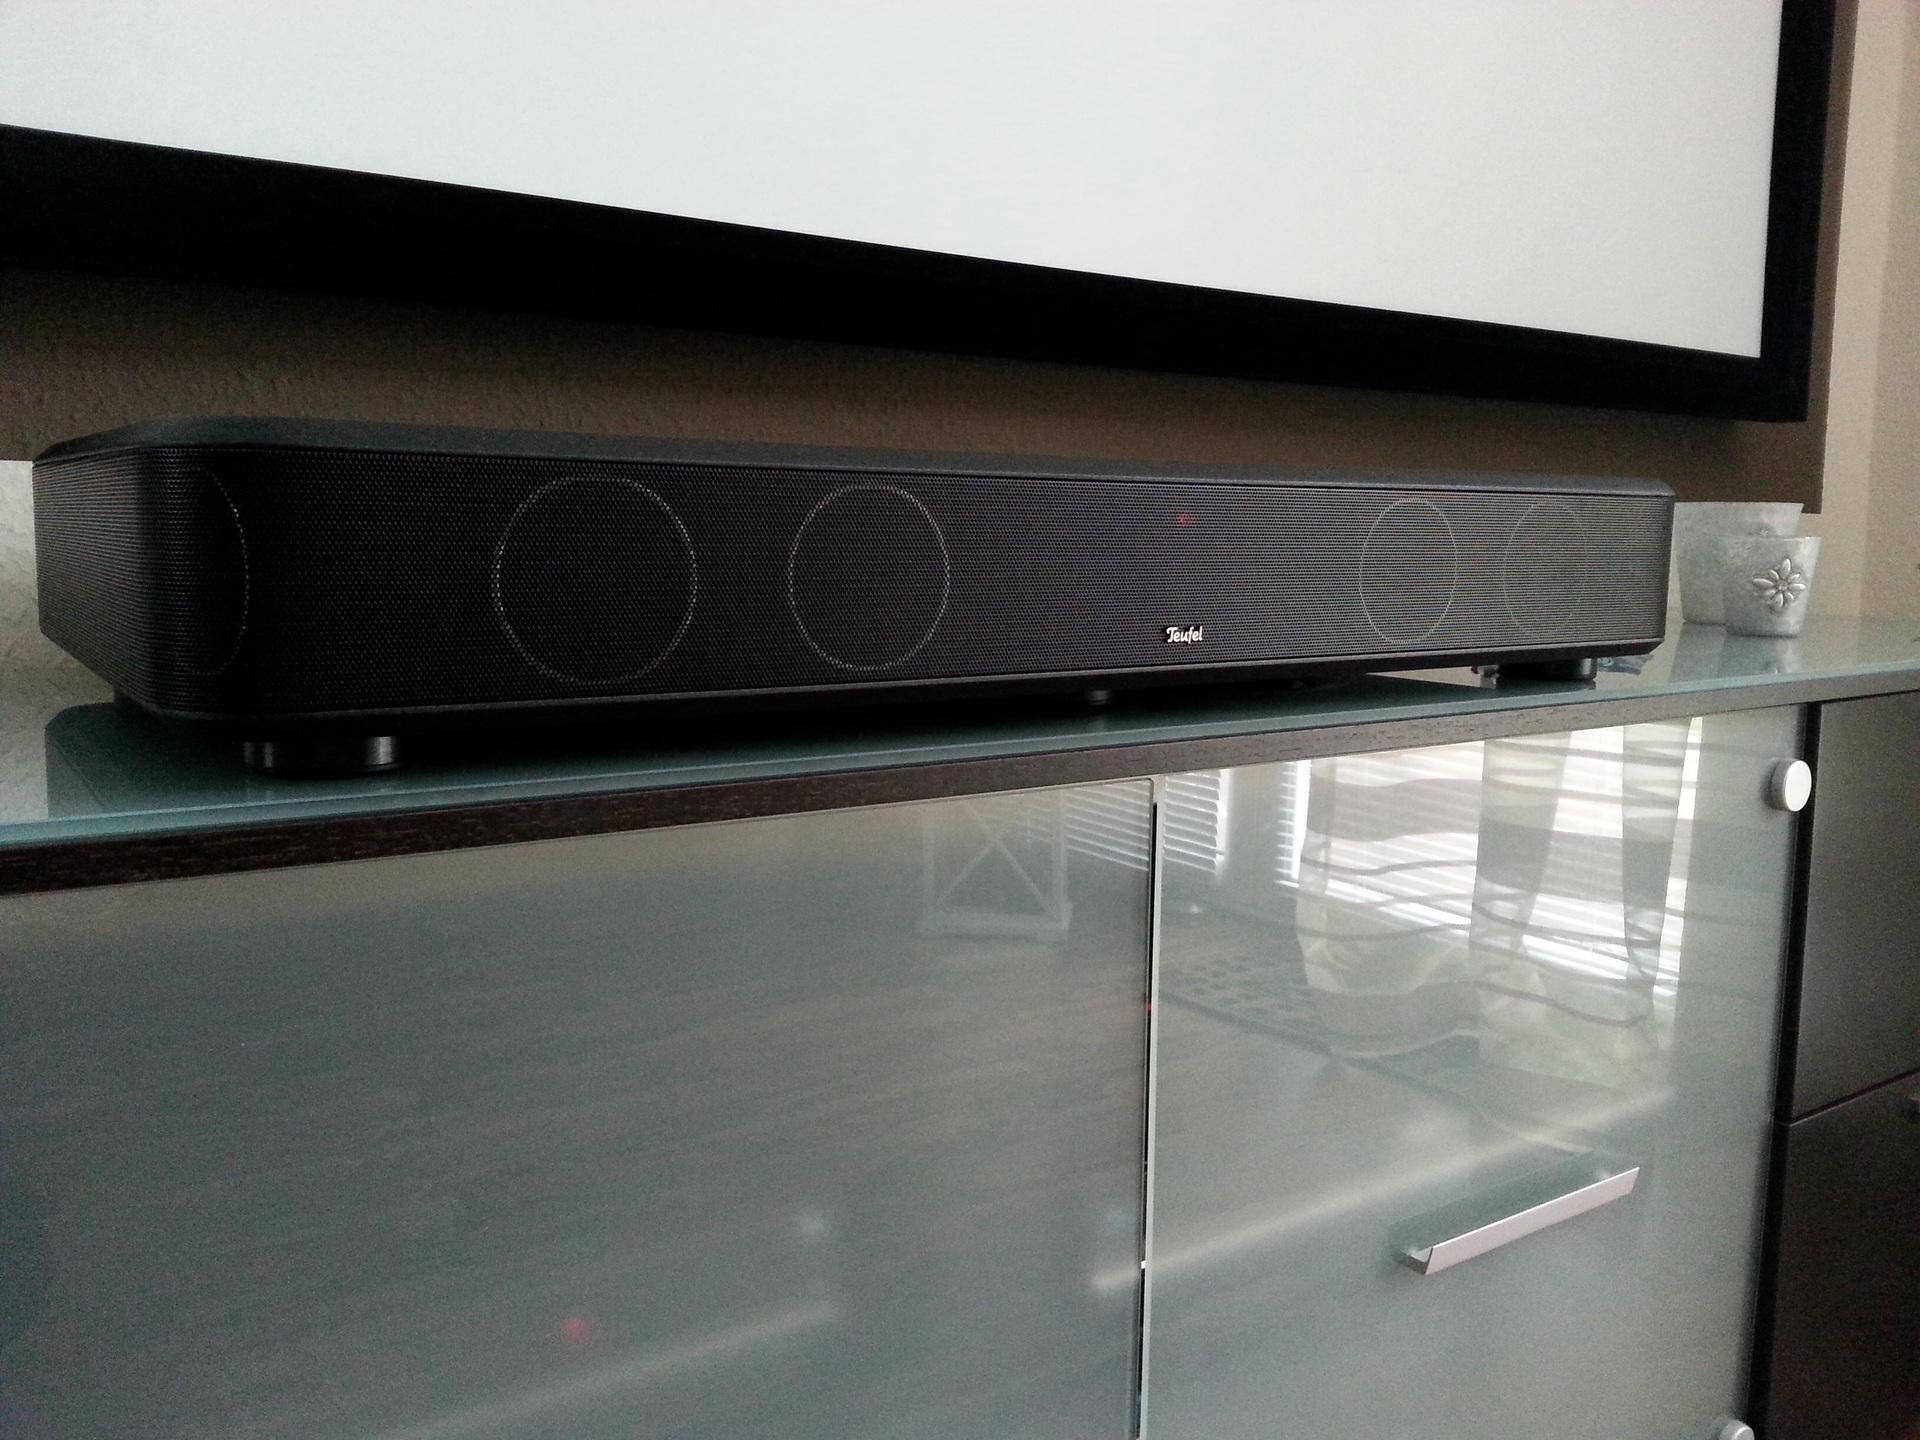 teufel cinebase cinebase heimkino komplettsysteme surround teufel hifi. Black Bedroom Furniture Sets. Home Design Ideas